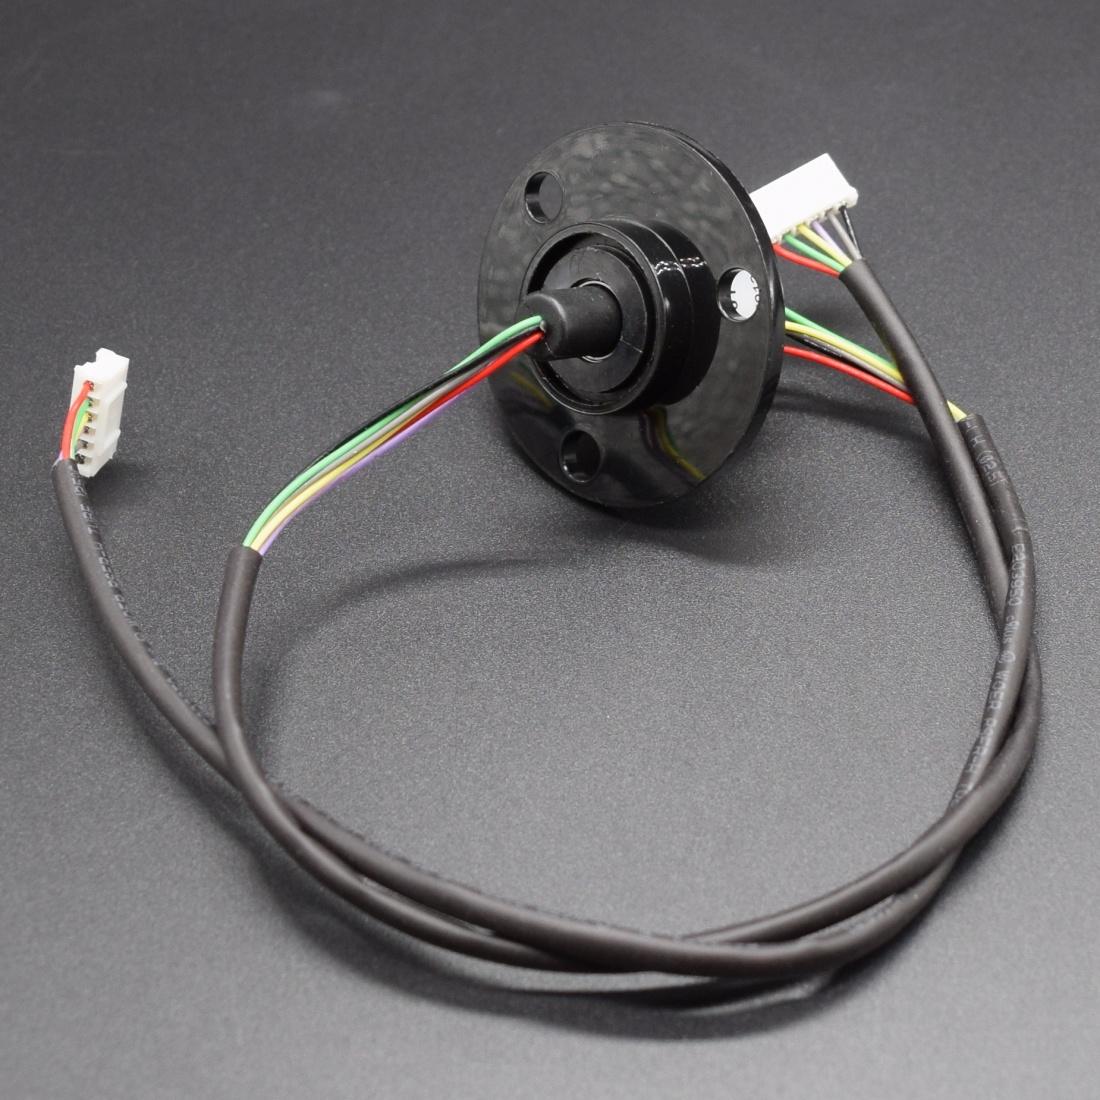 SRC022 - Compact Slip Ring Slip rings with flange 240v/2Amps